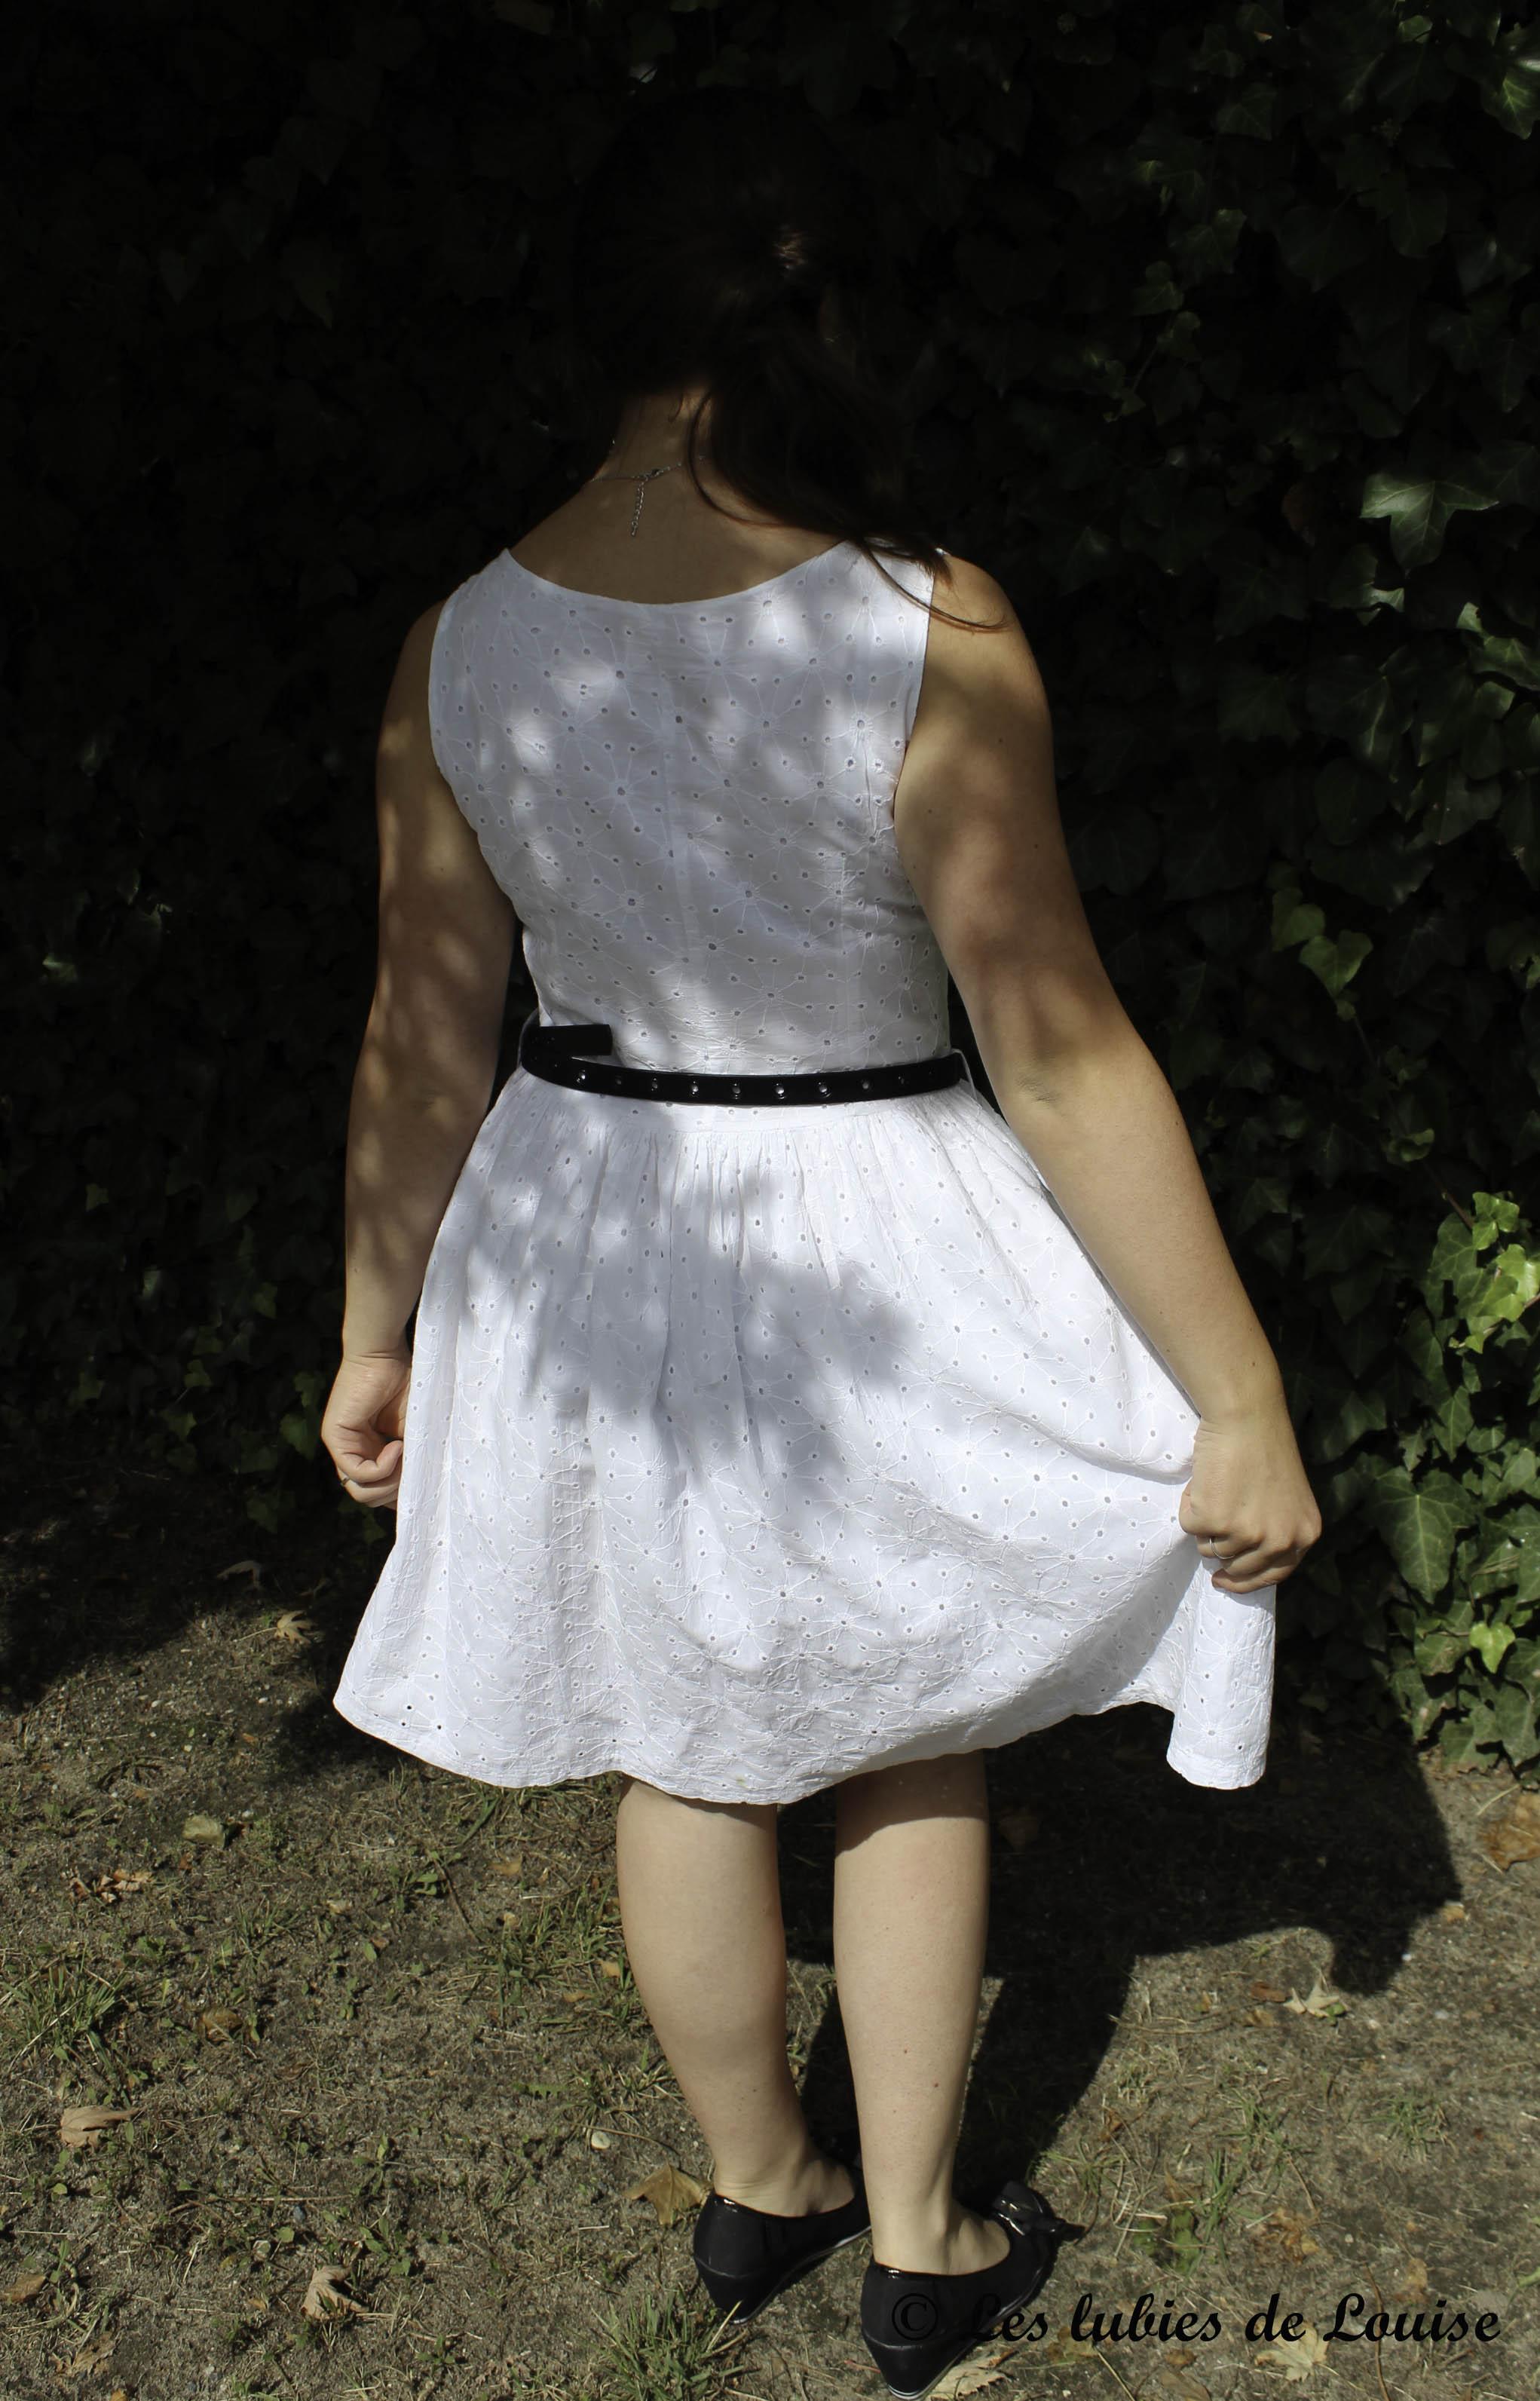 Petite robe broderie anglaise blanche - Les lubies de Louise (2 sur 11)